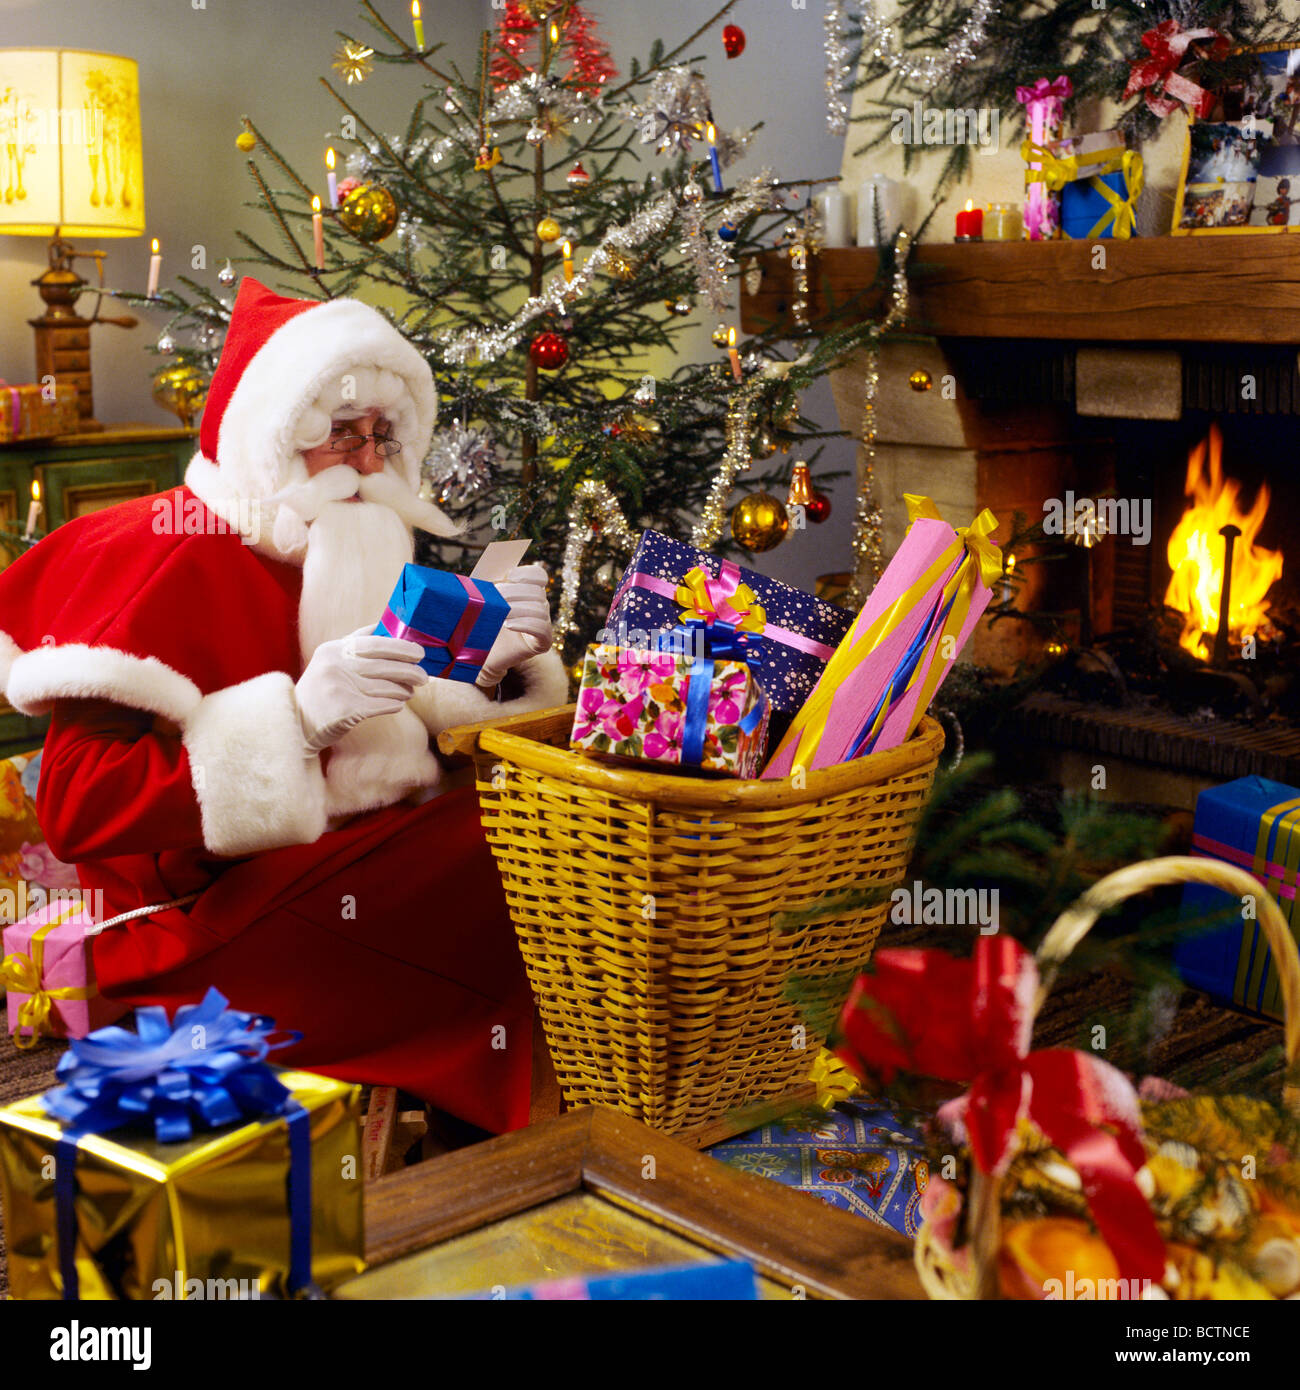 mr santa claus preparing christmas presents under the tree - Santa Claus With Presents